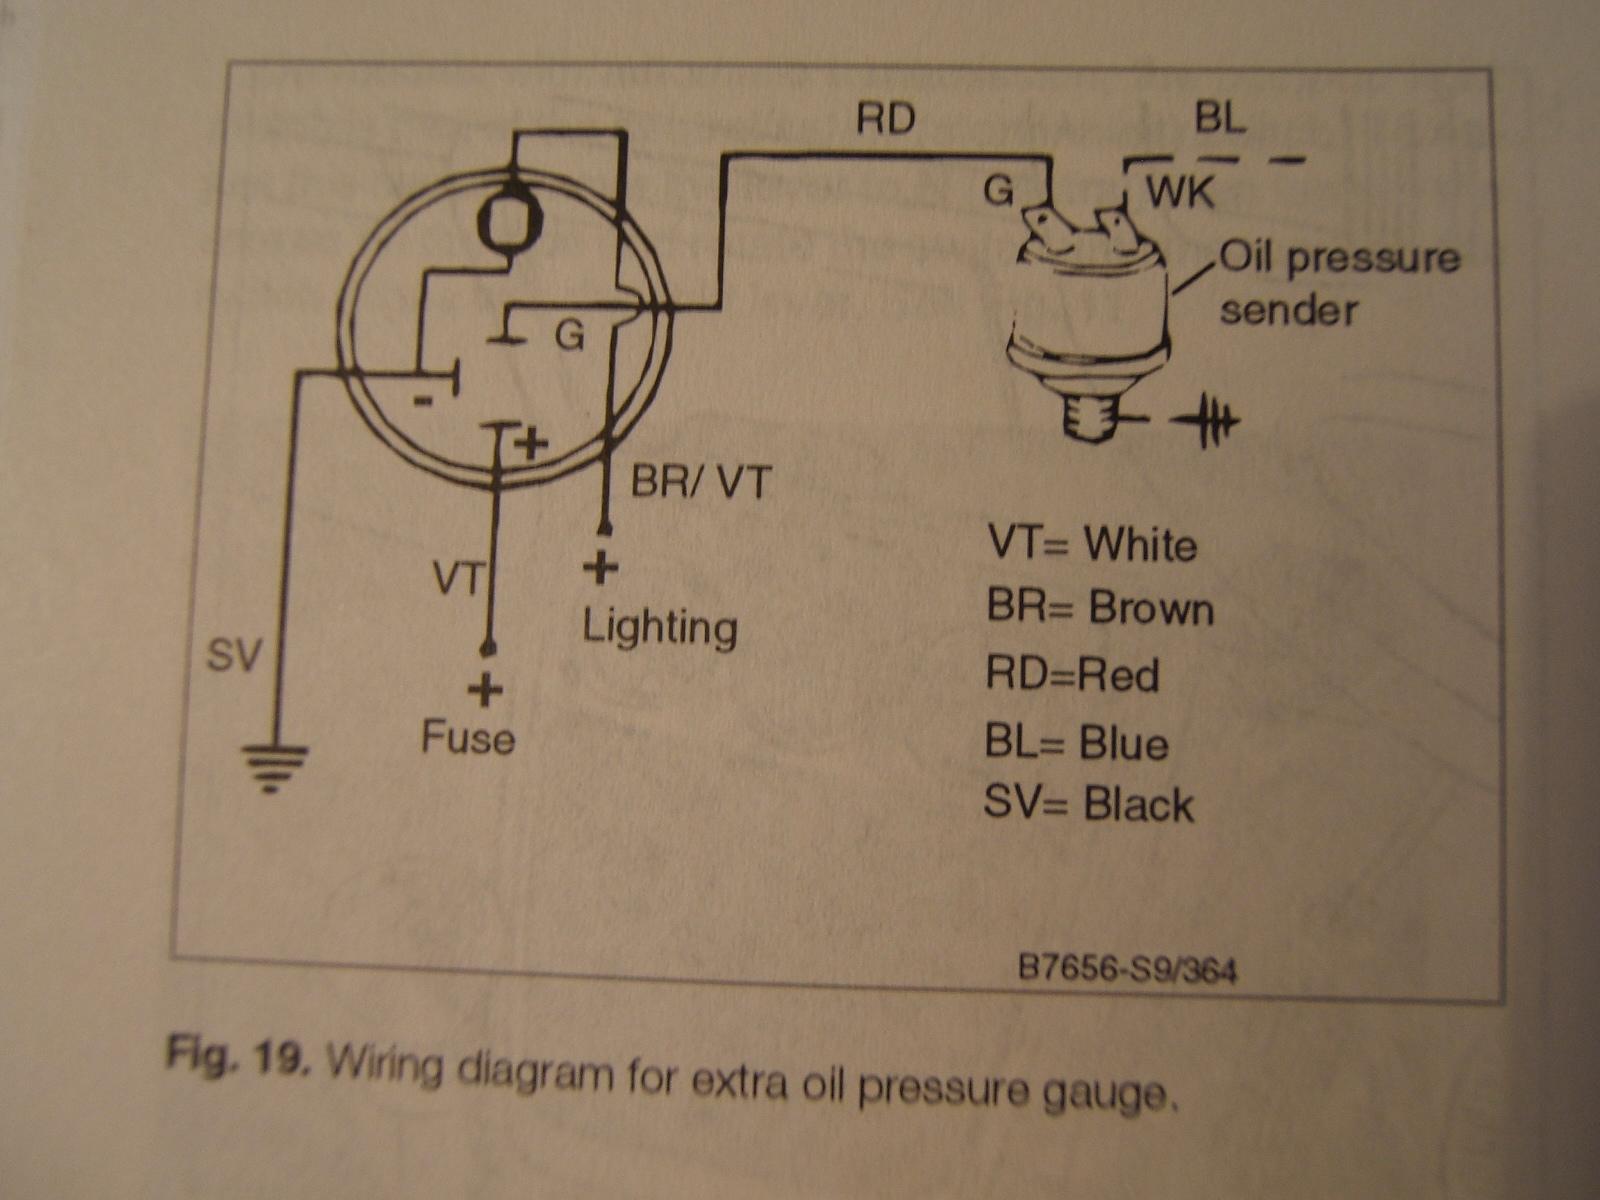 DV_1427] Vdo Oil Pressure Gauge Wiring Diagram Digifizmini Oil Pressure  Free DiagramGray Cajos Mohammedshrine Librar Wiring 101